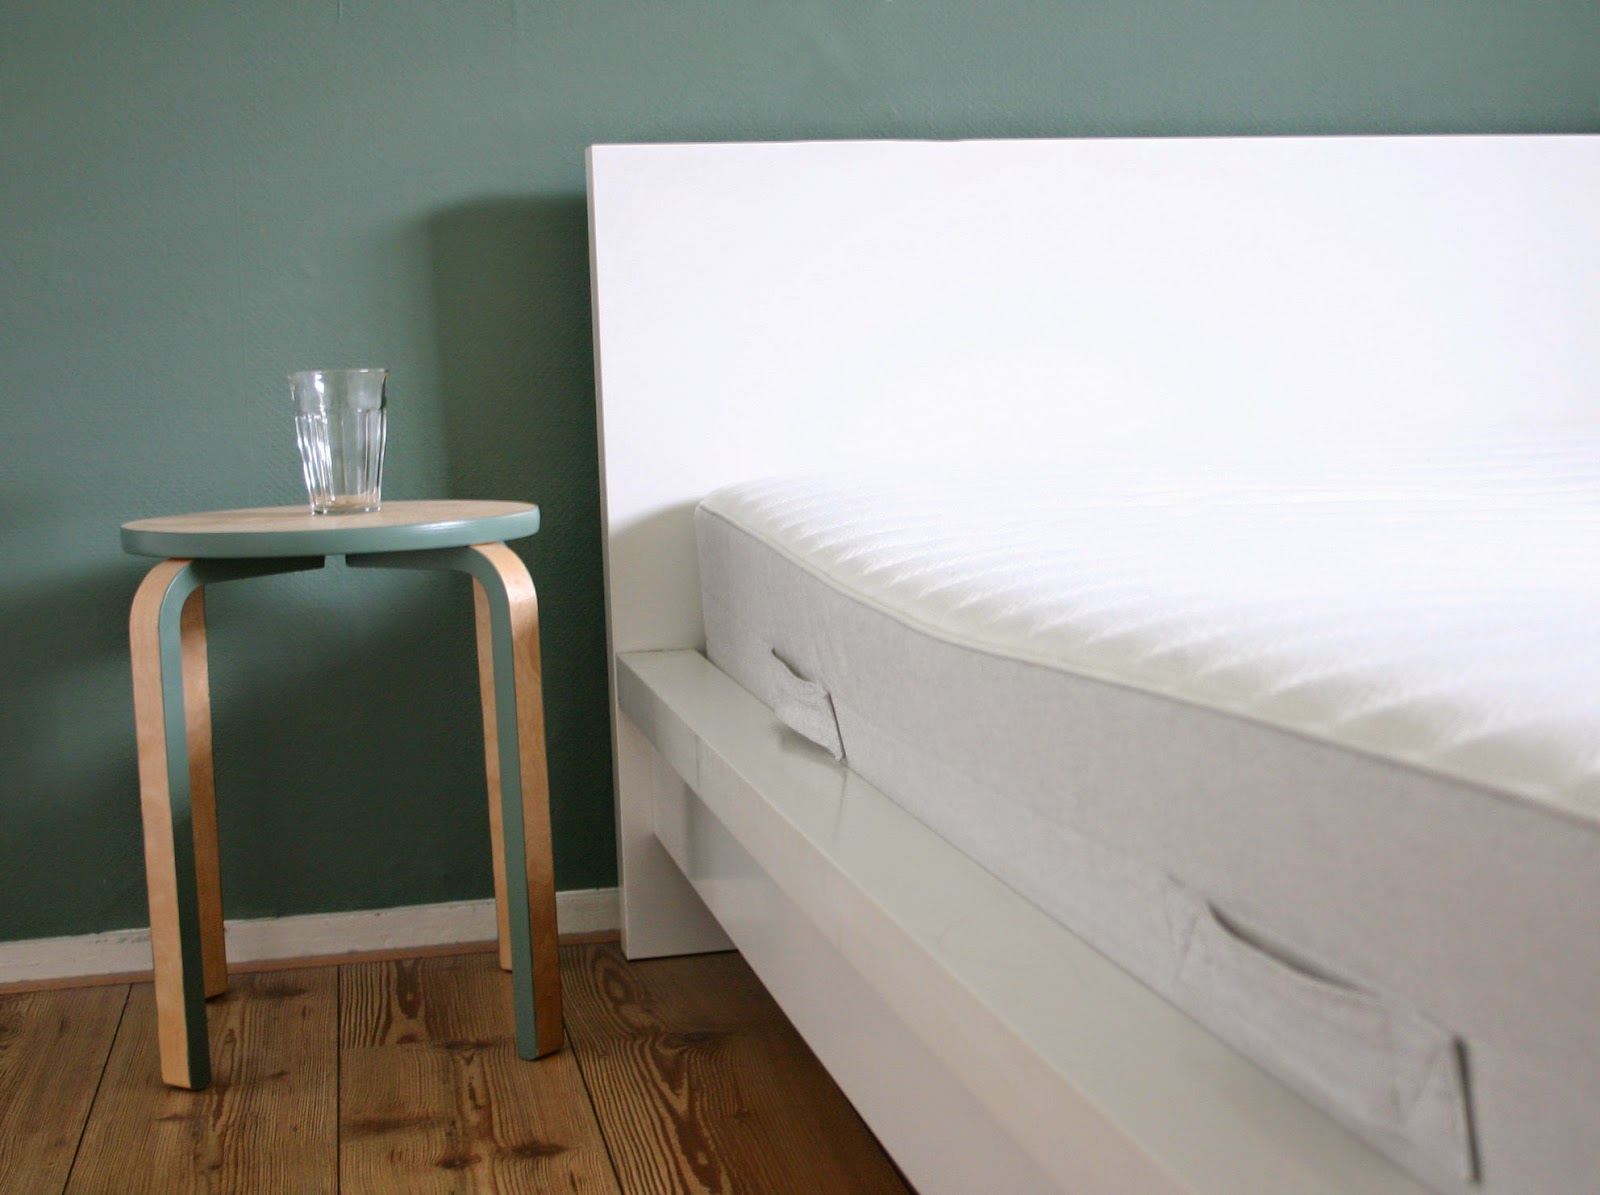 Fotos Slaapkamer Restylen : Pica blogt!: slaapkamer restylen